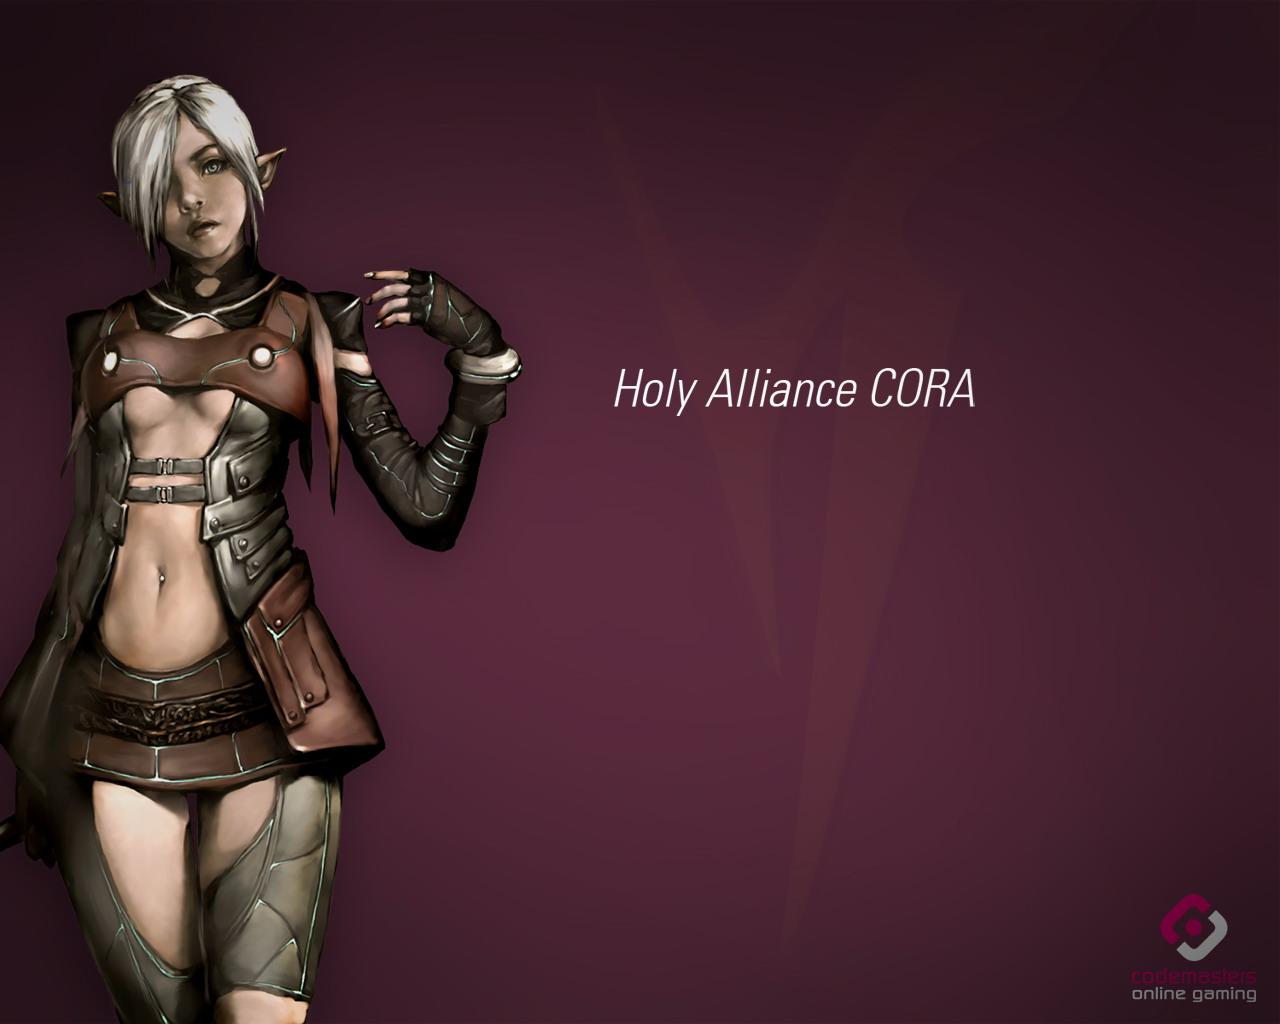 http://4.bp.blogspot.com/-FZwXBvnJE0w/TexYZNOSmzI/AAAAAAAAABw/FXEhTm--wl4/s1600/Rf+Wallpaper+Cora.jpg